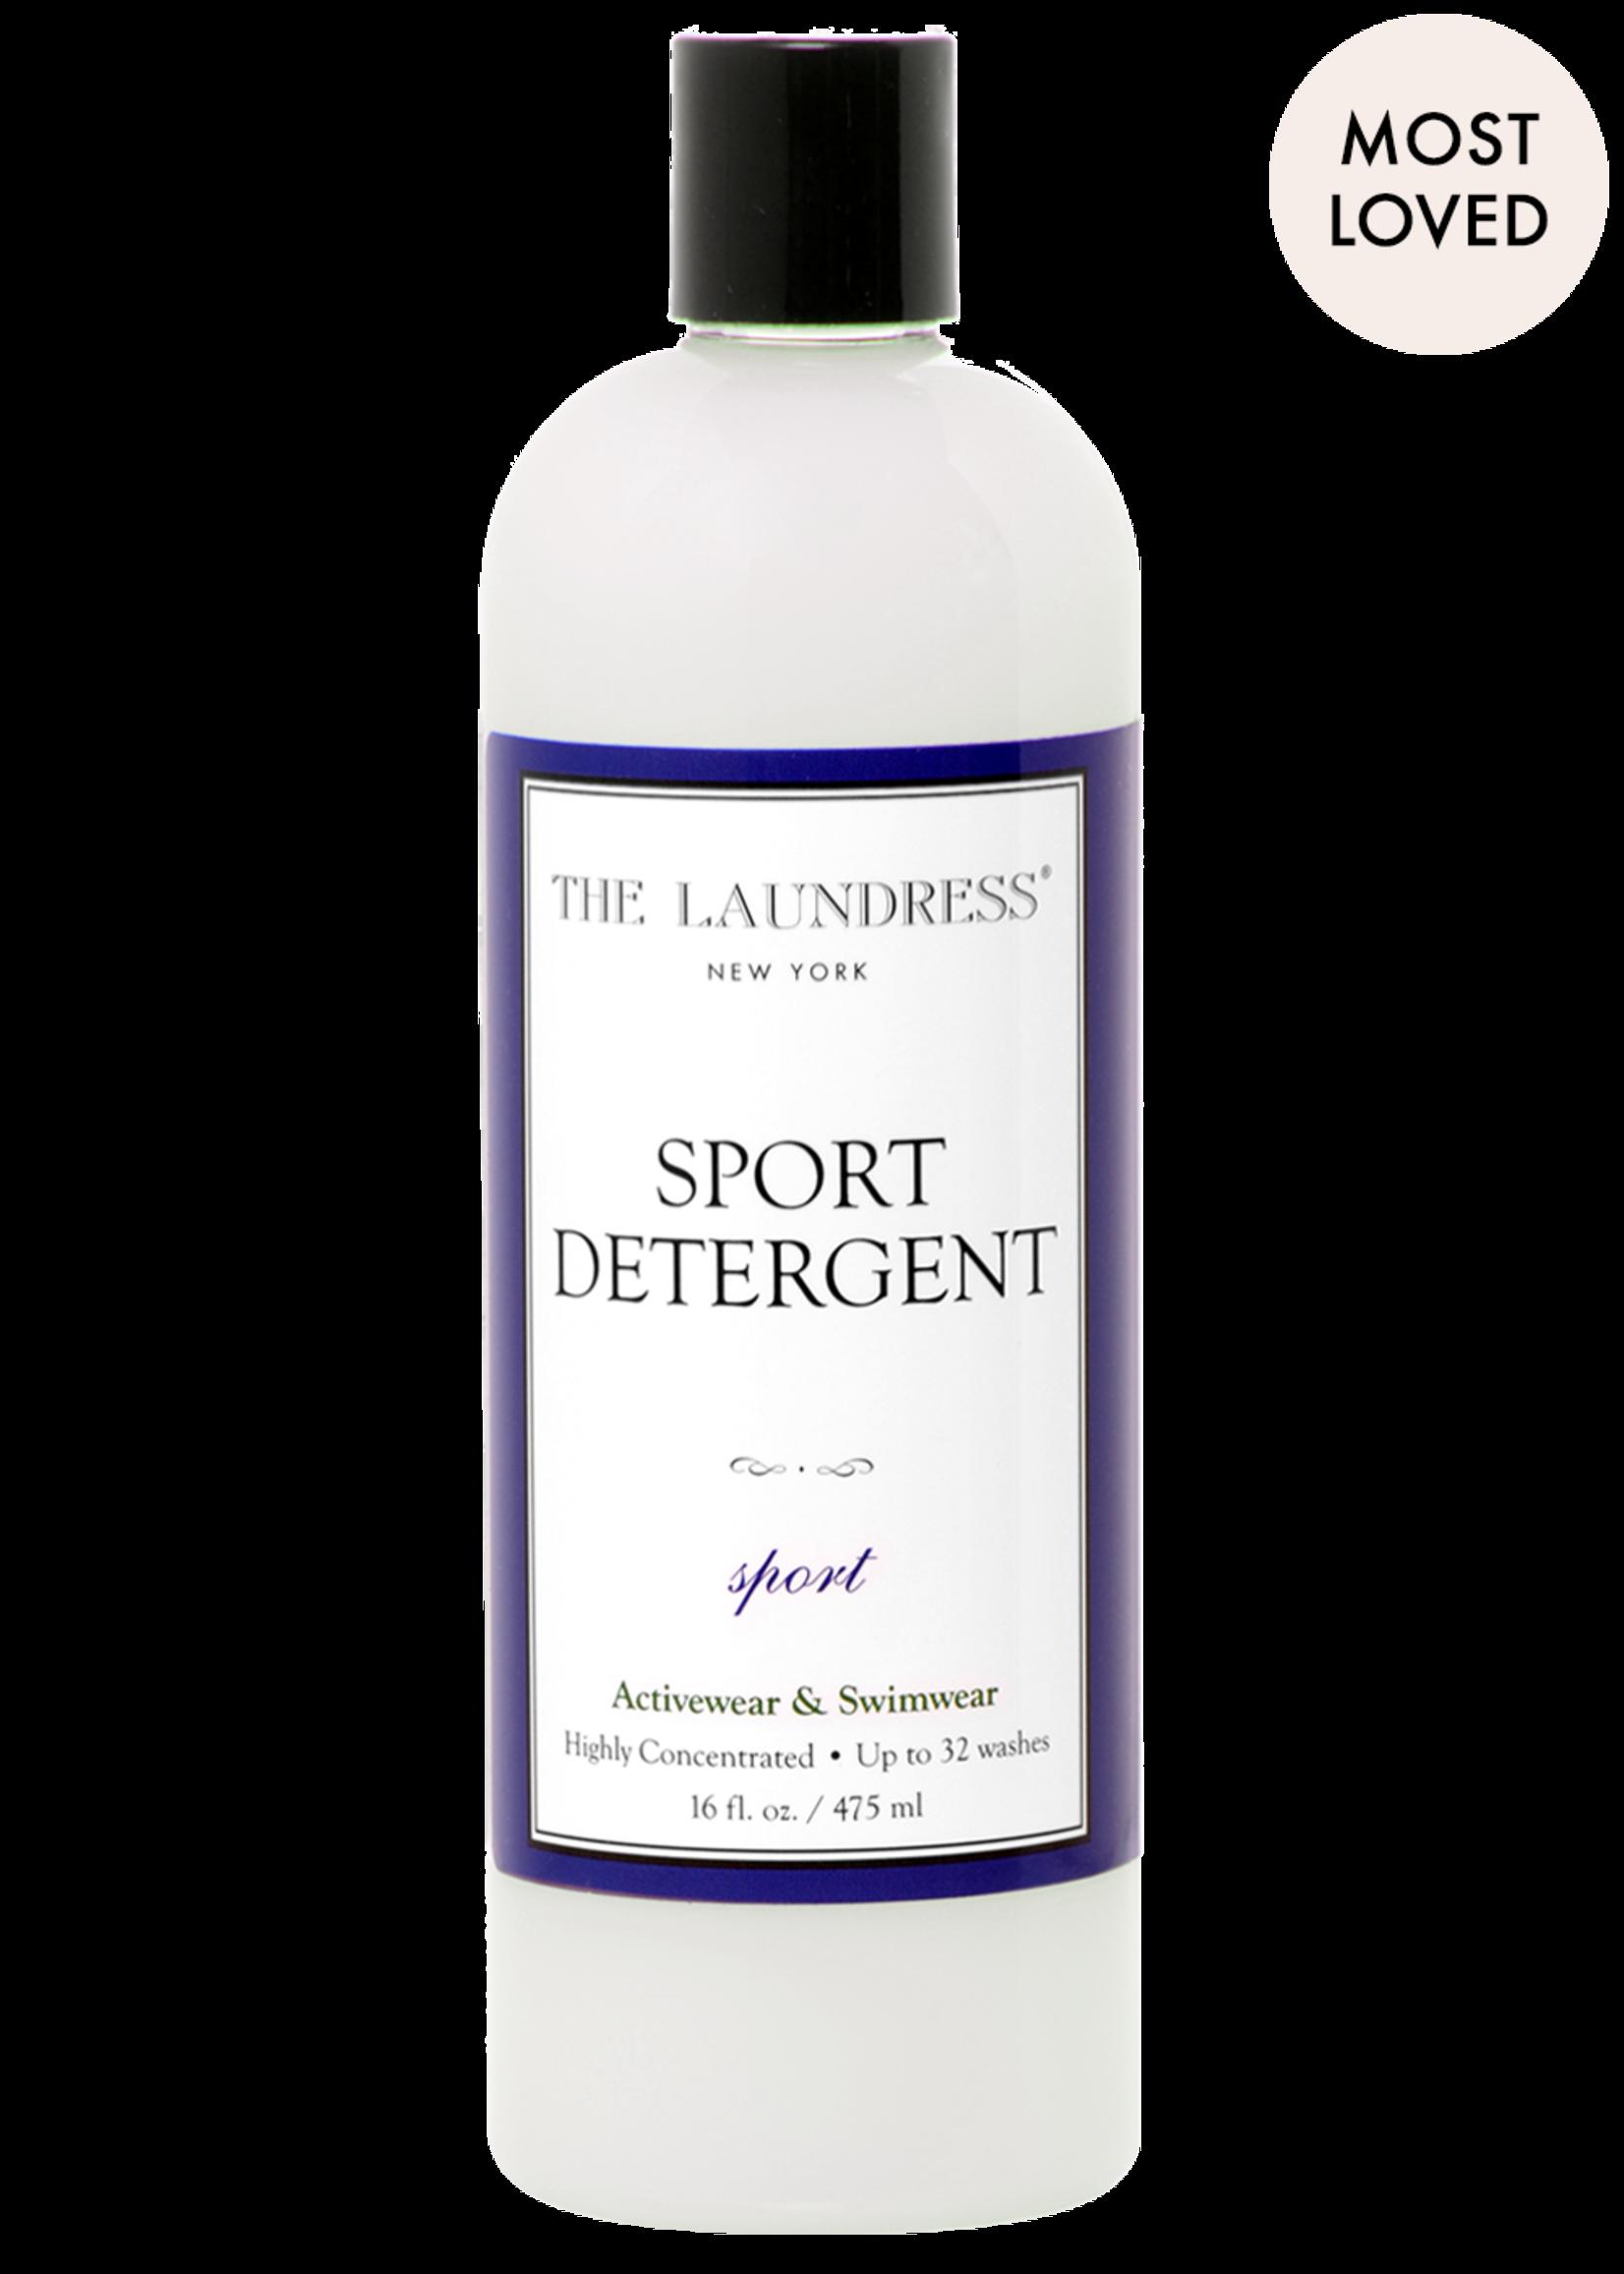 The Laundress New York Sport Detergent